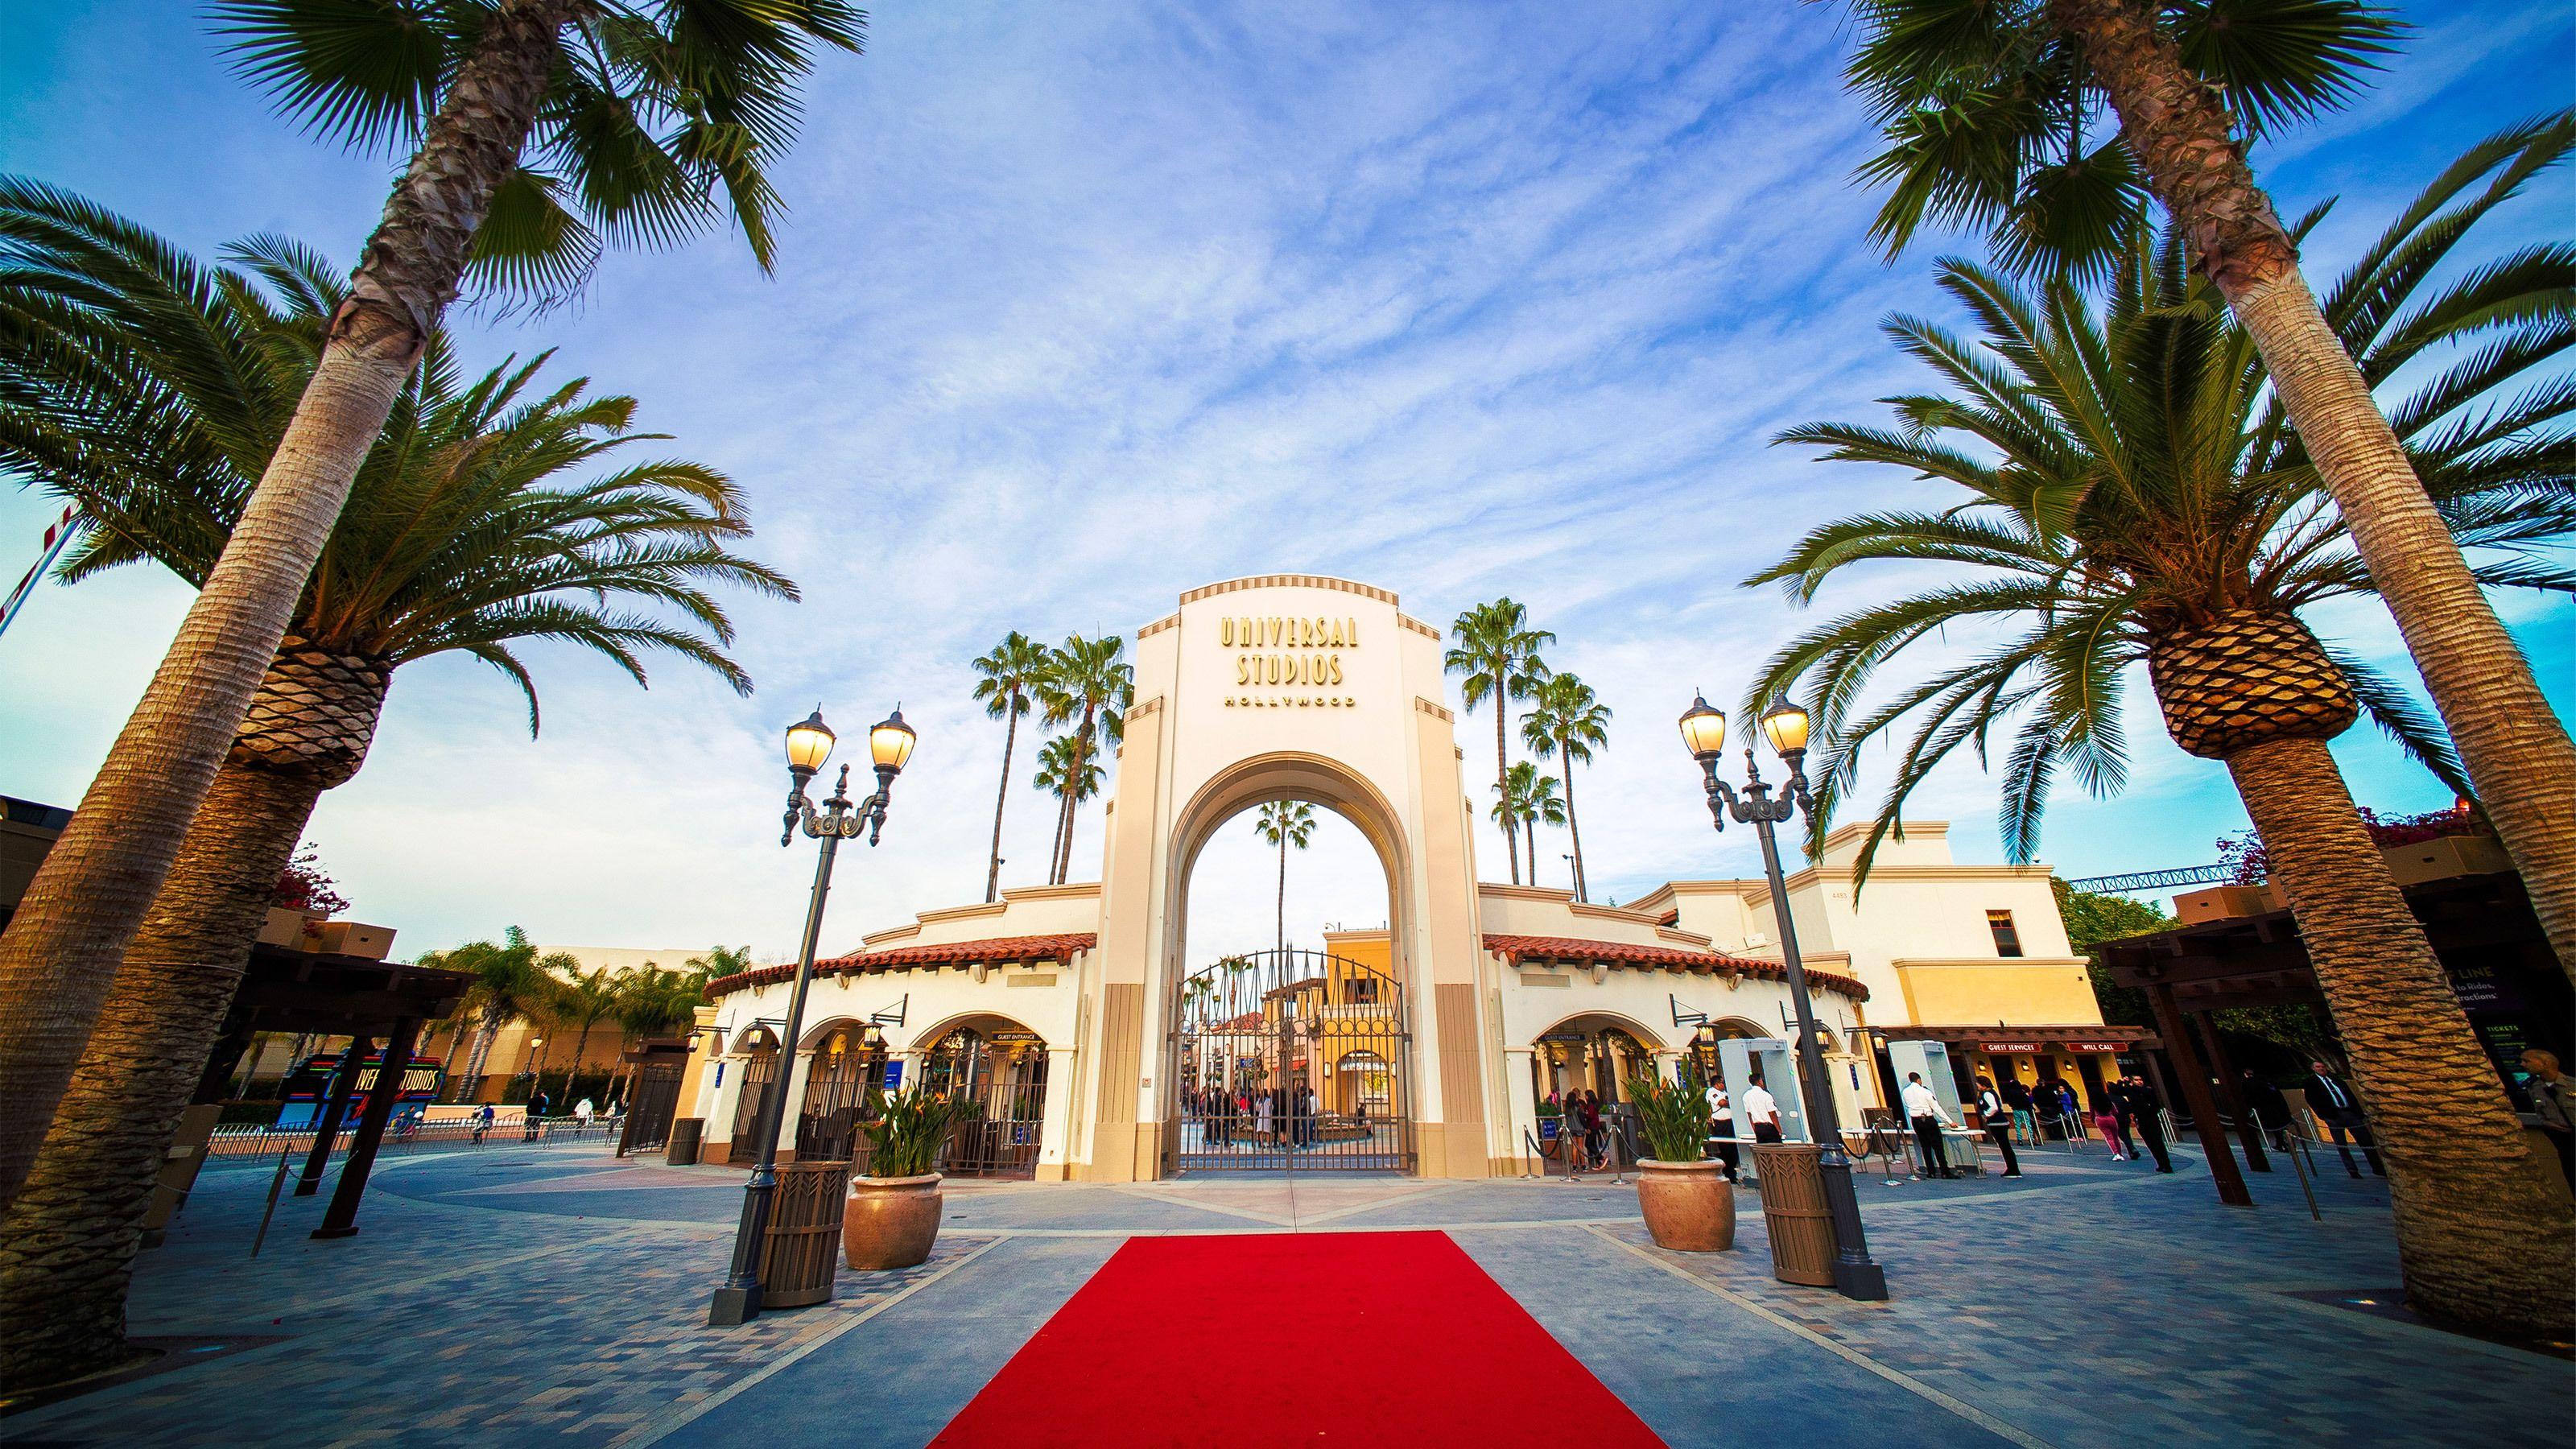 Universal Studios HollywoodTM - Universal ExpressTM Ticket